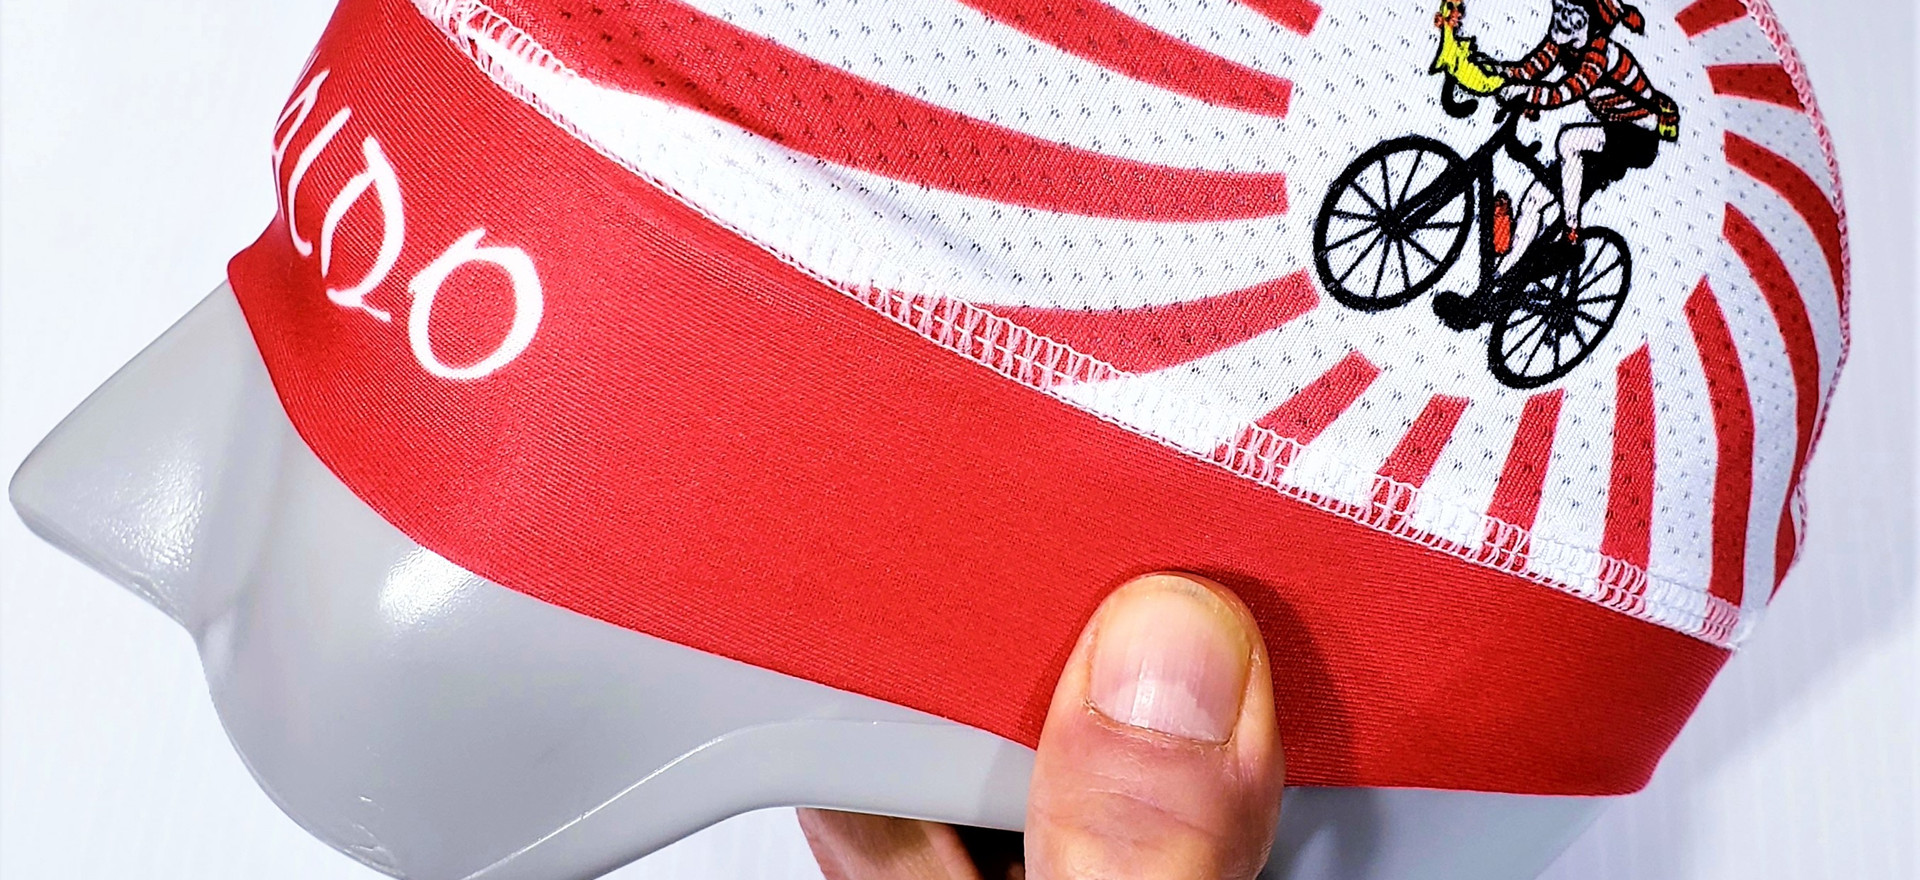 Custom sweat beanie | Sweat Beanie | custom skull caps | custom made beanies | custom made bandanas | custom bandanas | Custom Beanie for Cancer patients | Leukemia & Lymphoma Society | RAGBRAI | American Lung Association – Lung Ride | Tour de Cure Diabetes – American Diabetes Association